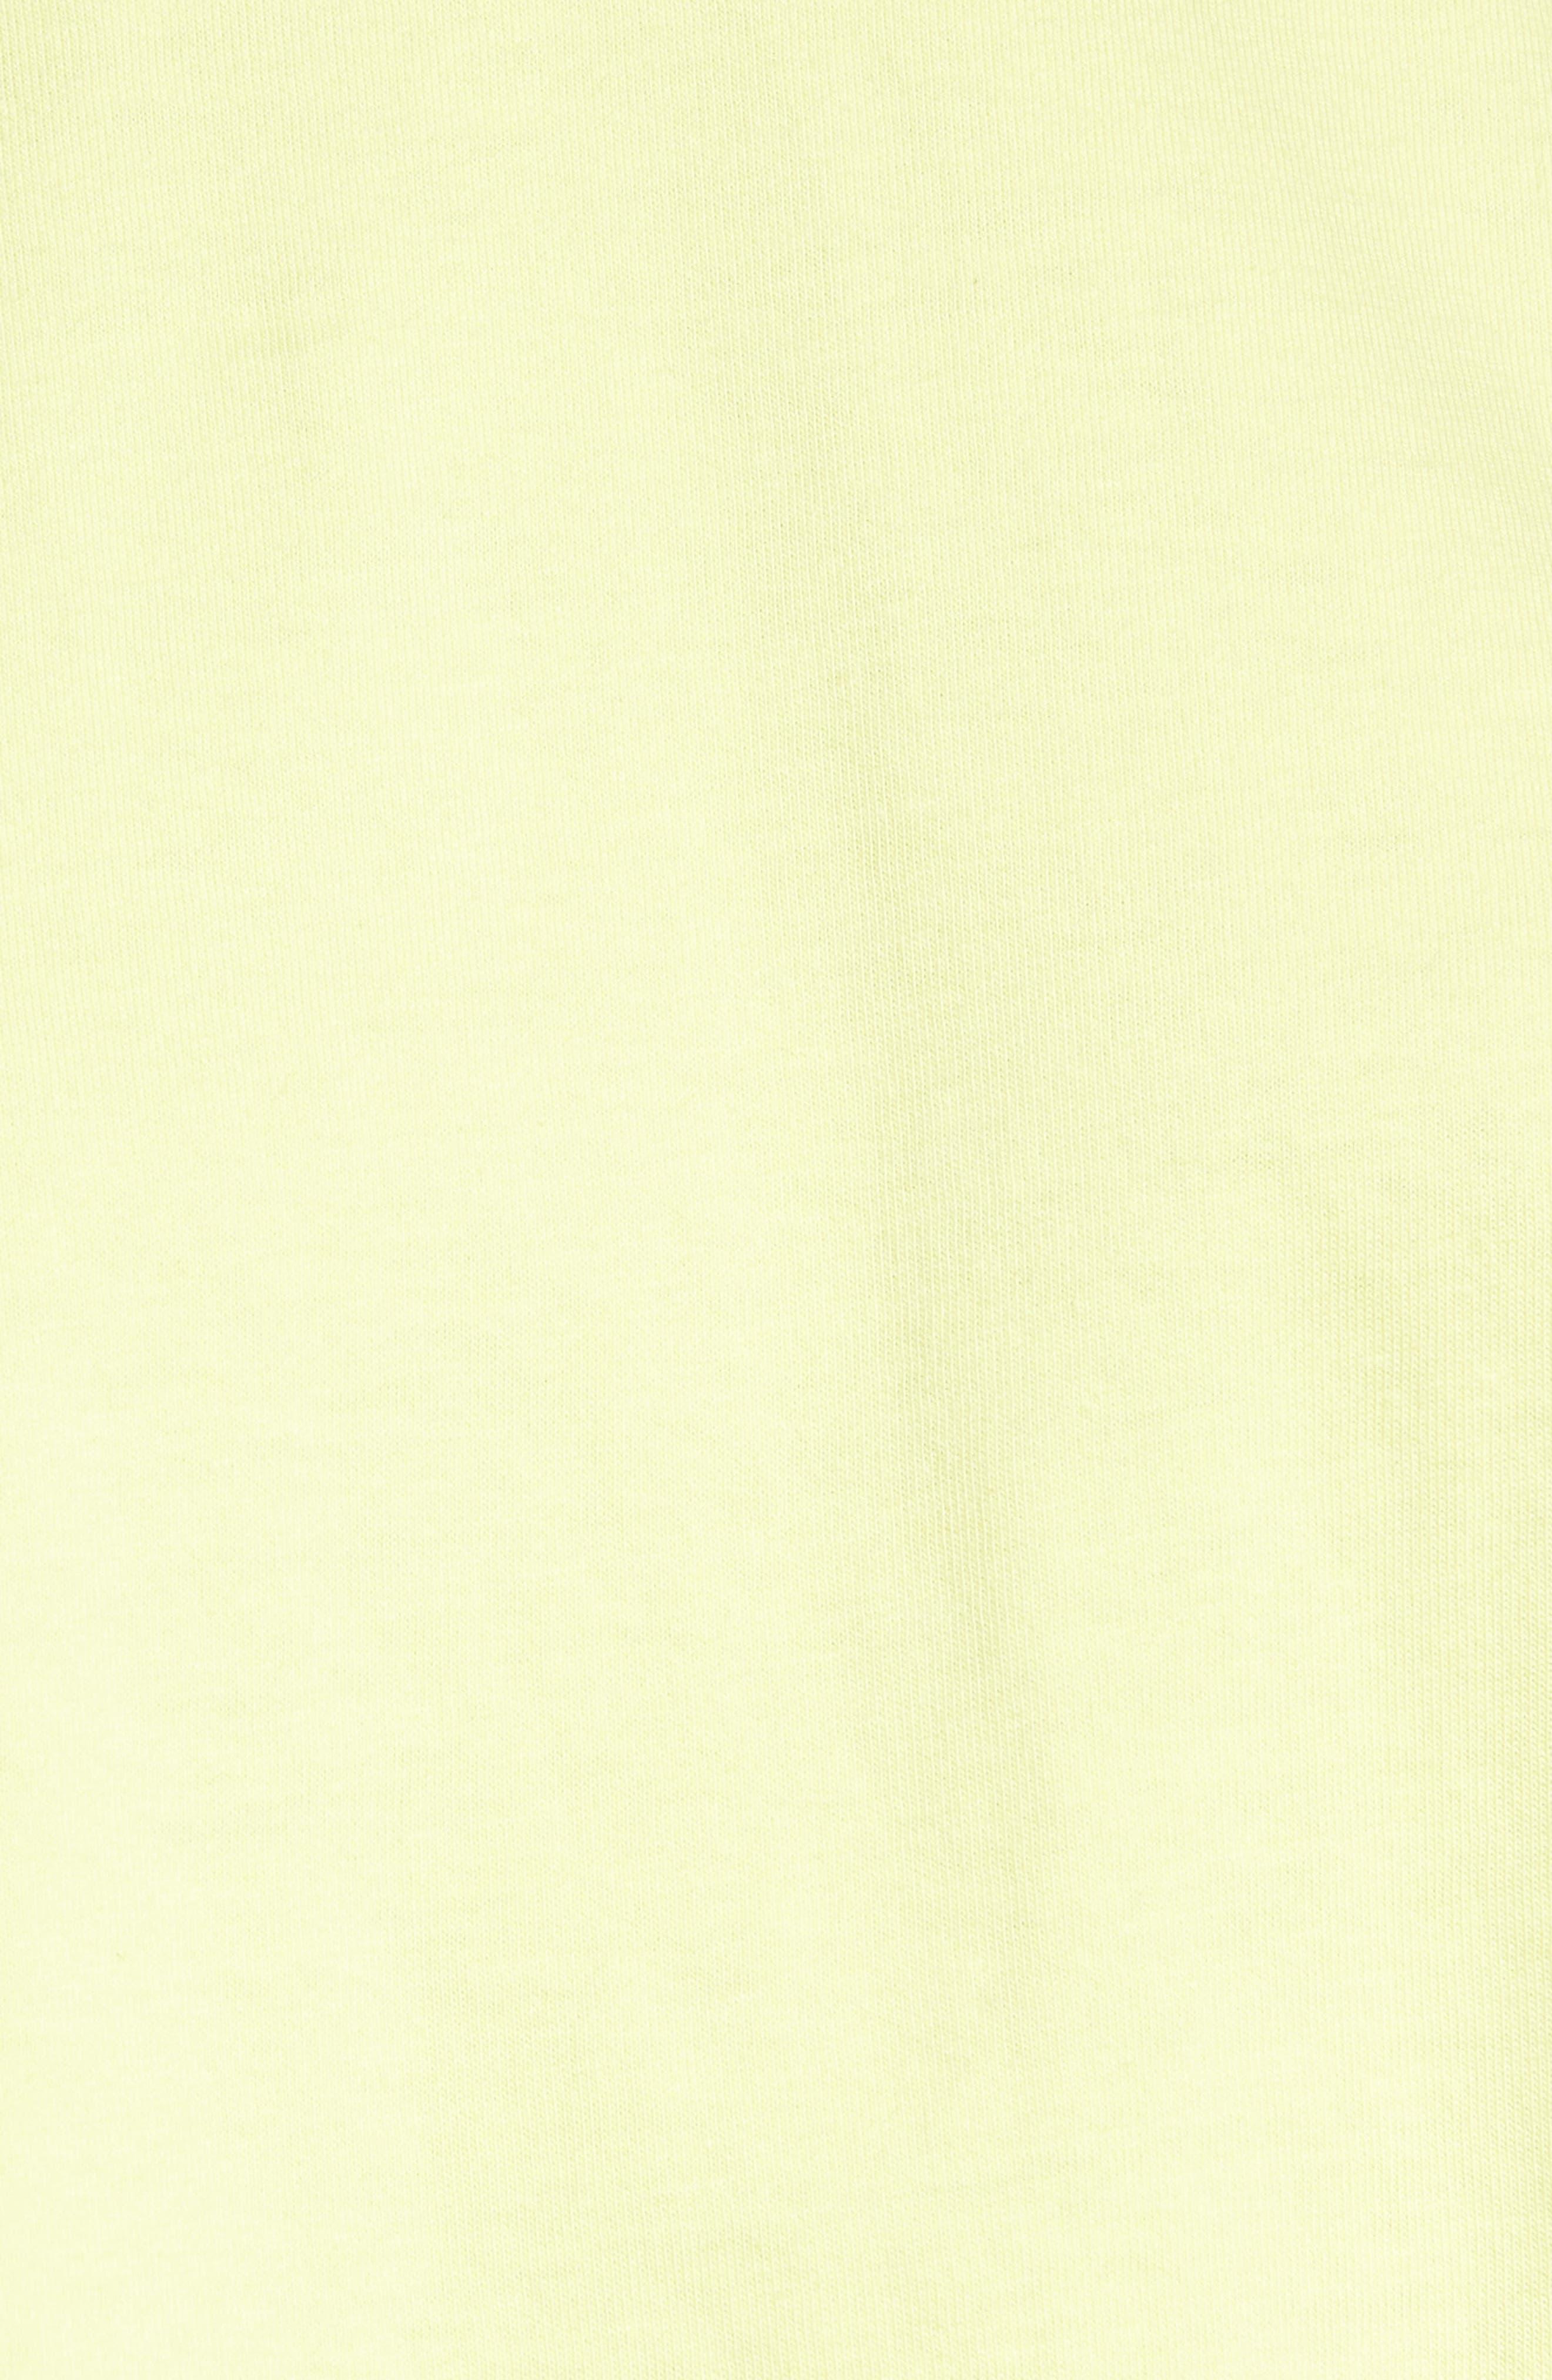 Shoulder Pad Tee,                             Alternate thumbnail 5, color,                             330